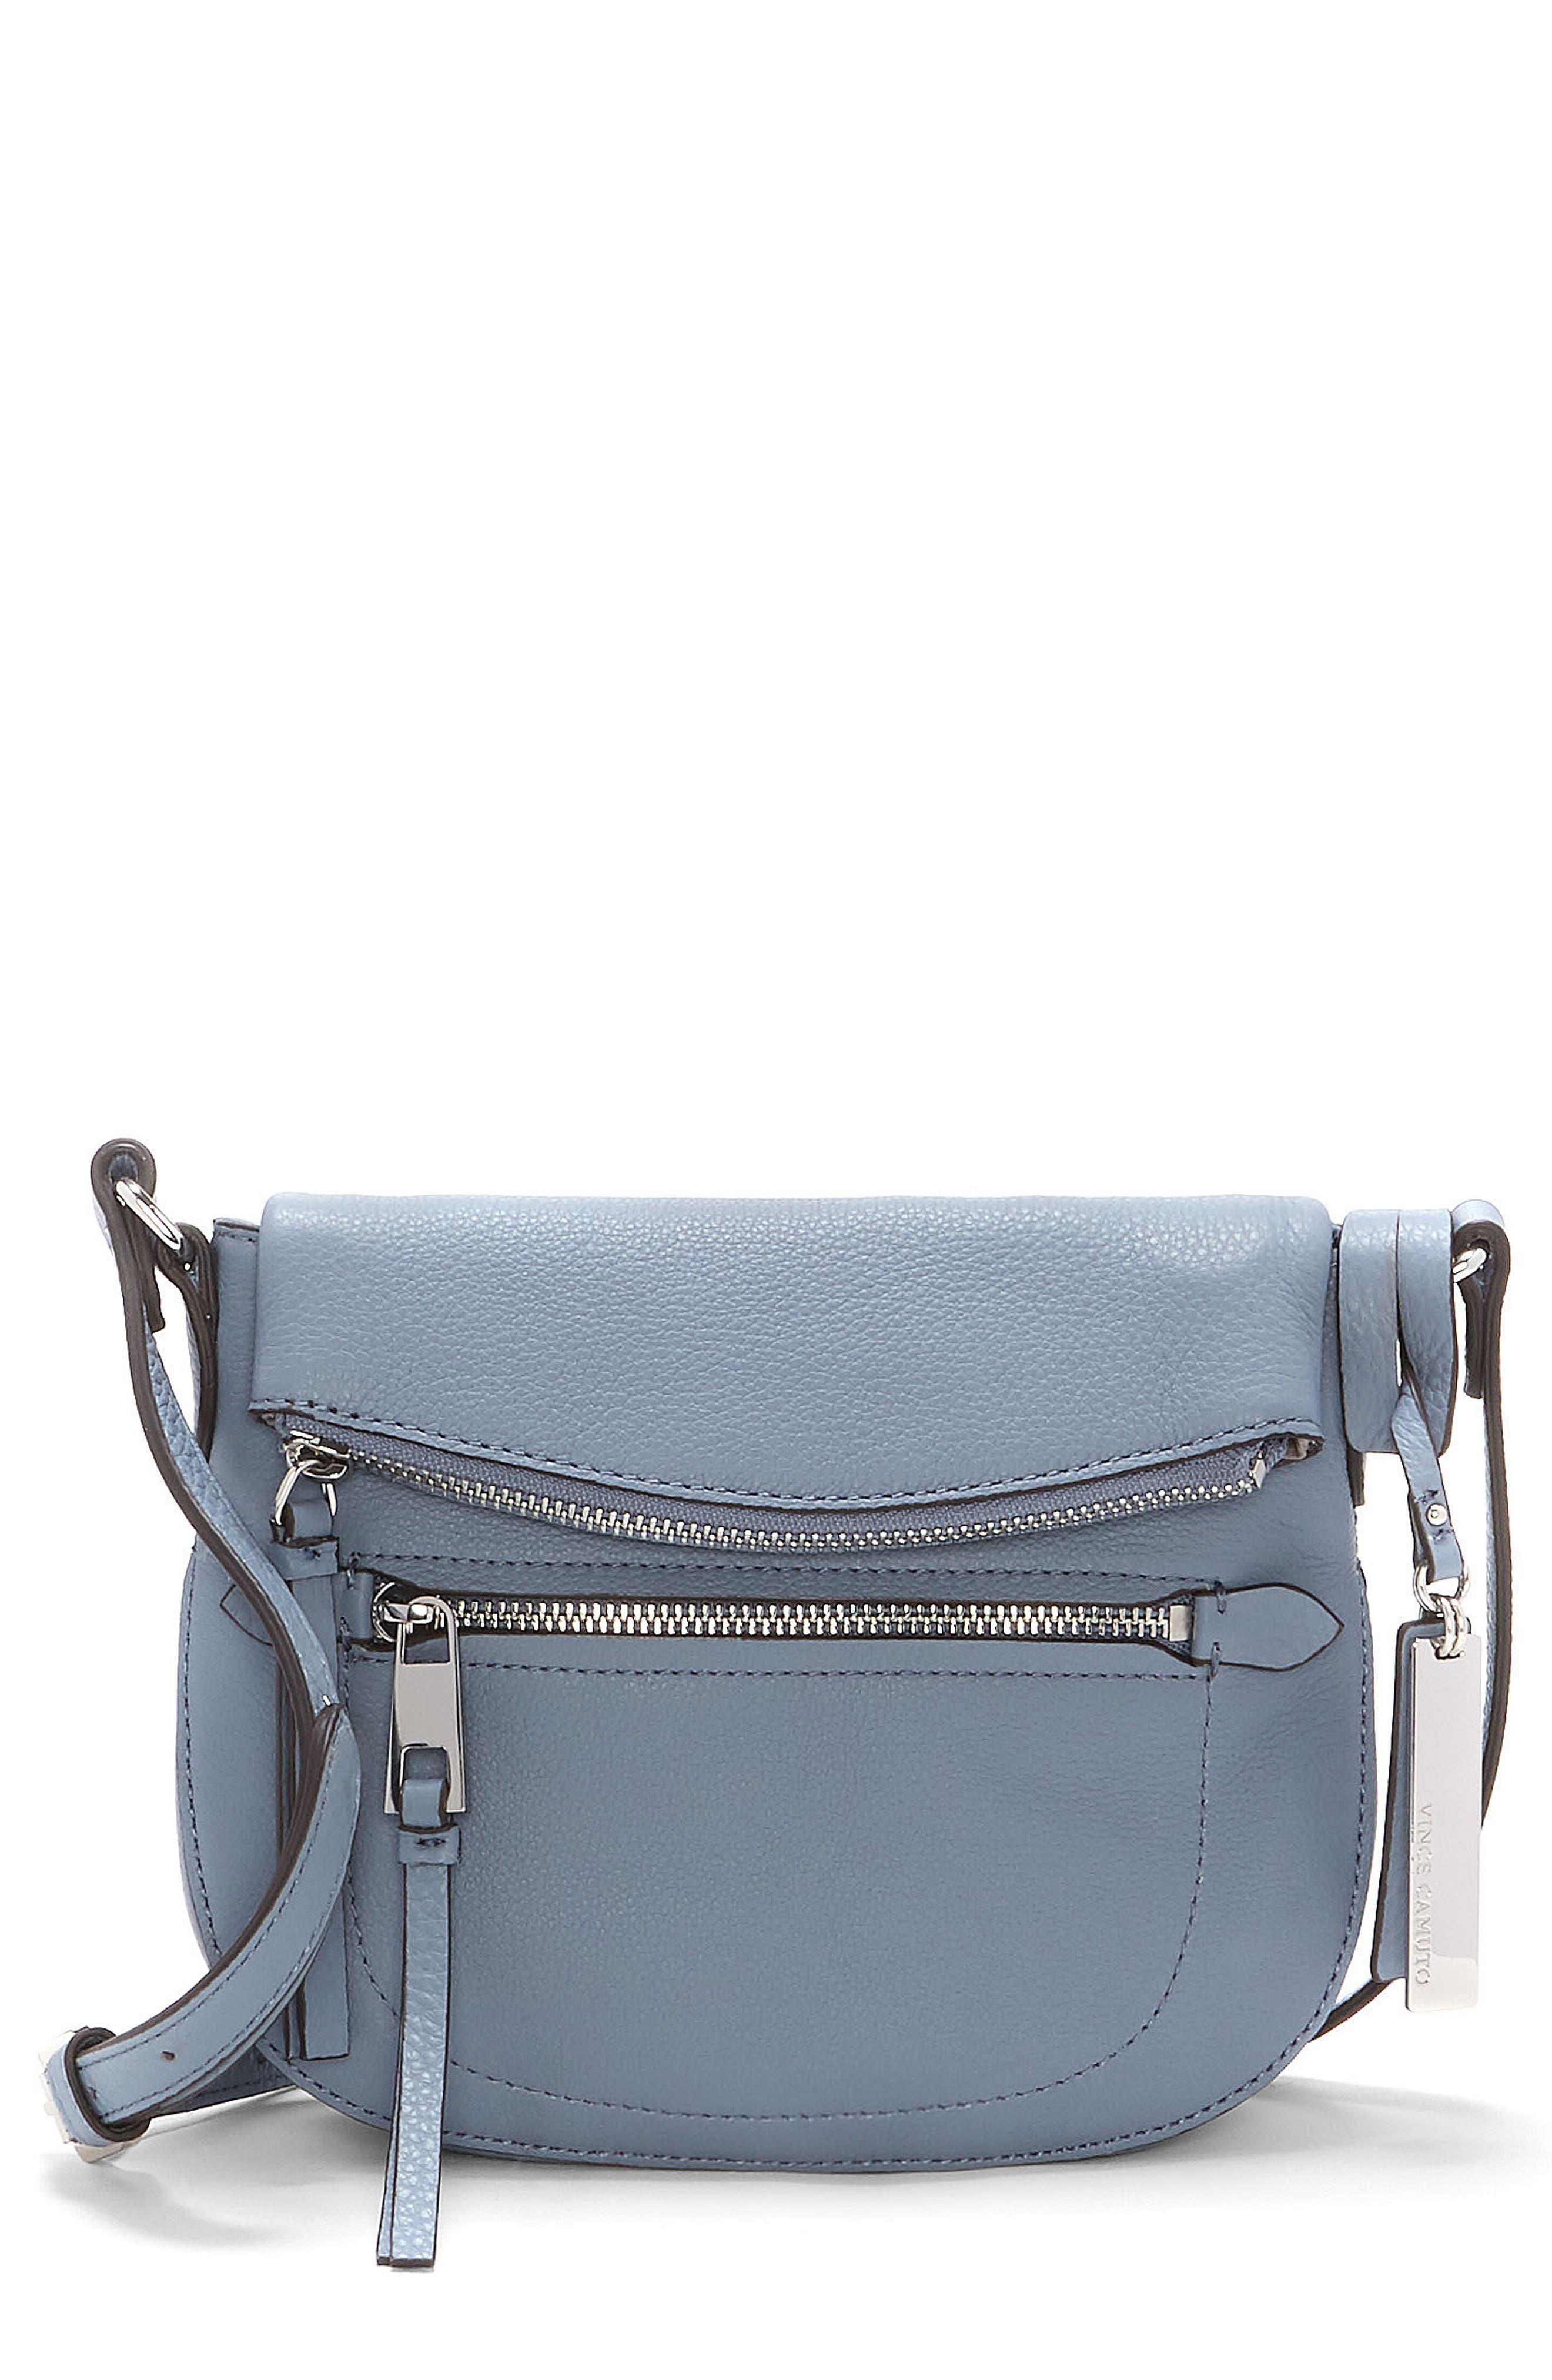 Vince Camuto Tala Small Leather Crossbody Bag